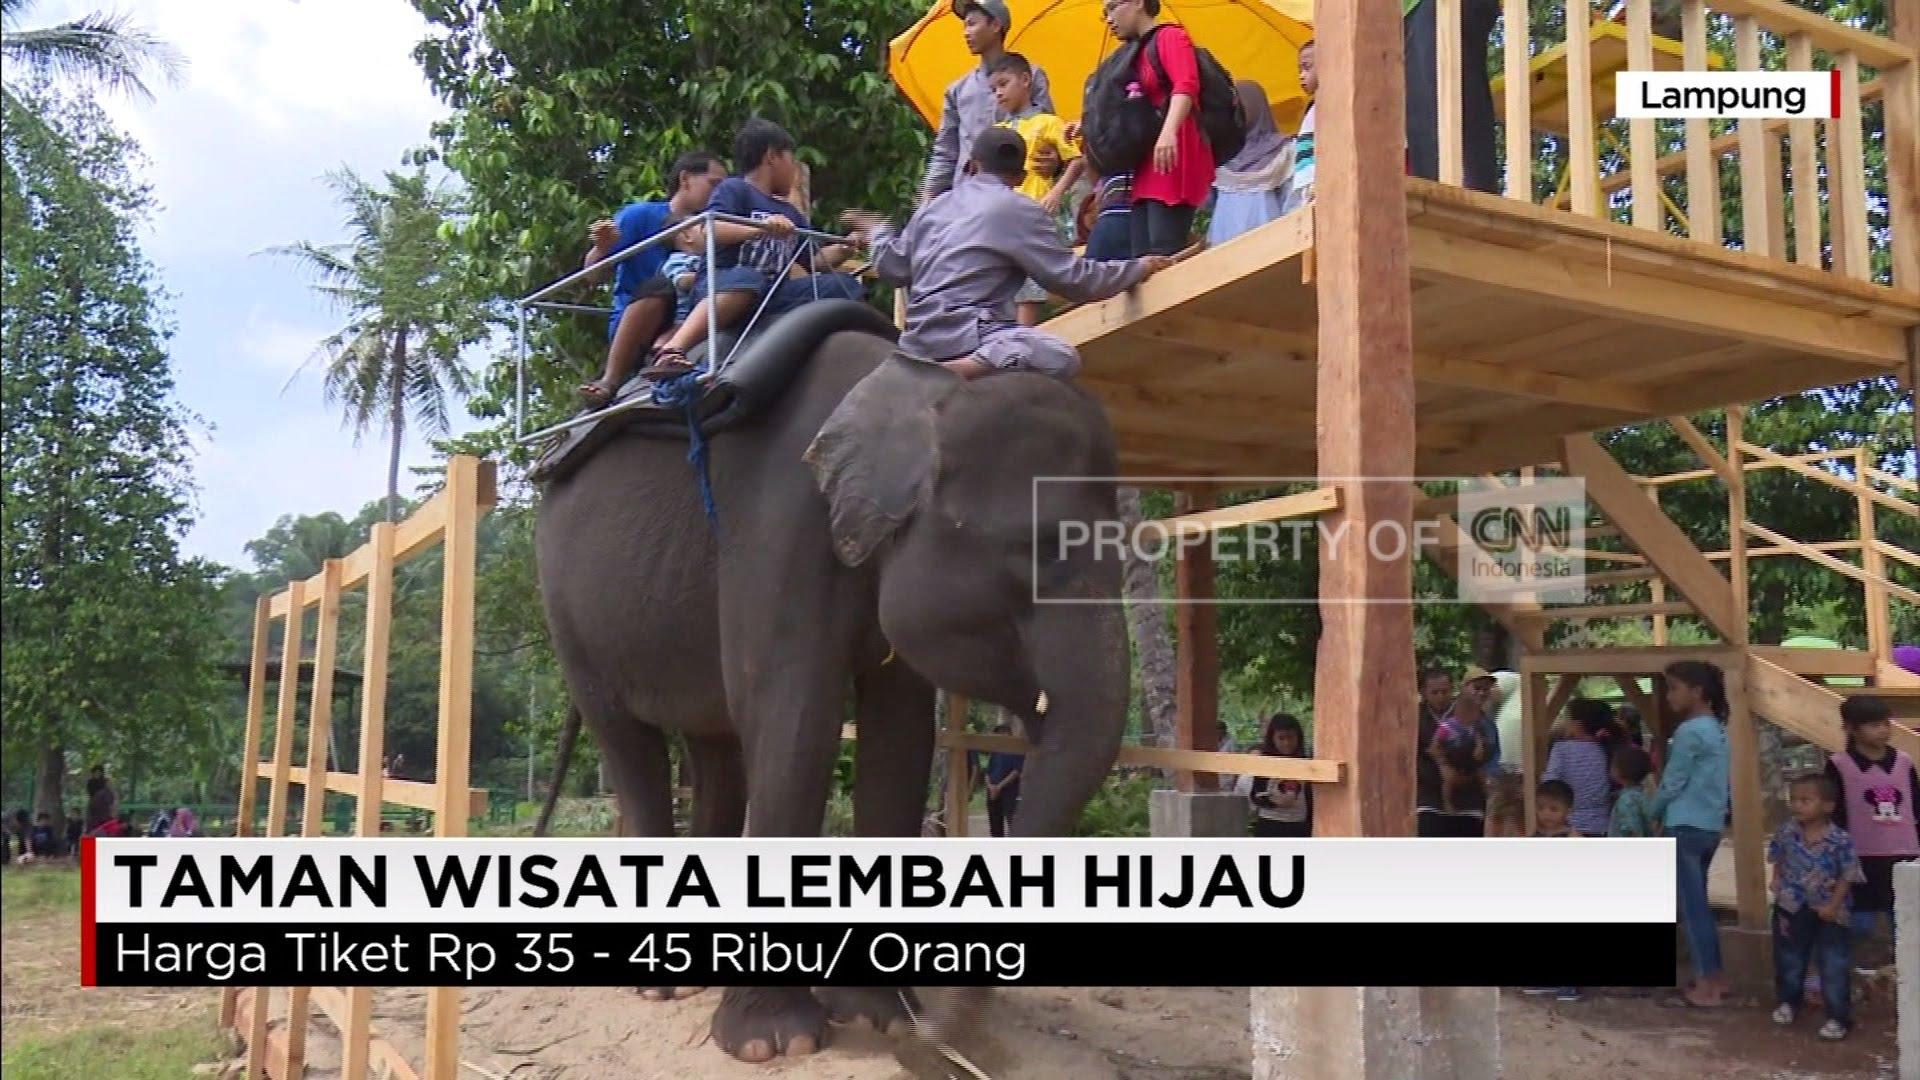 Tunggang Gajah Taman Wisata Lembah Hijau Youtube Kota Bandar Lampung